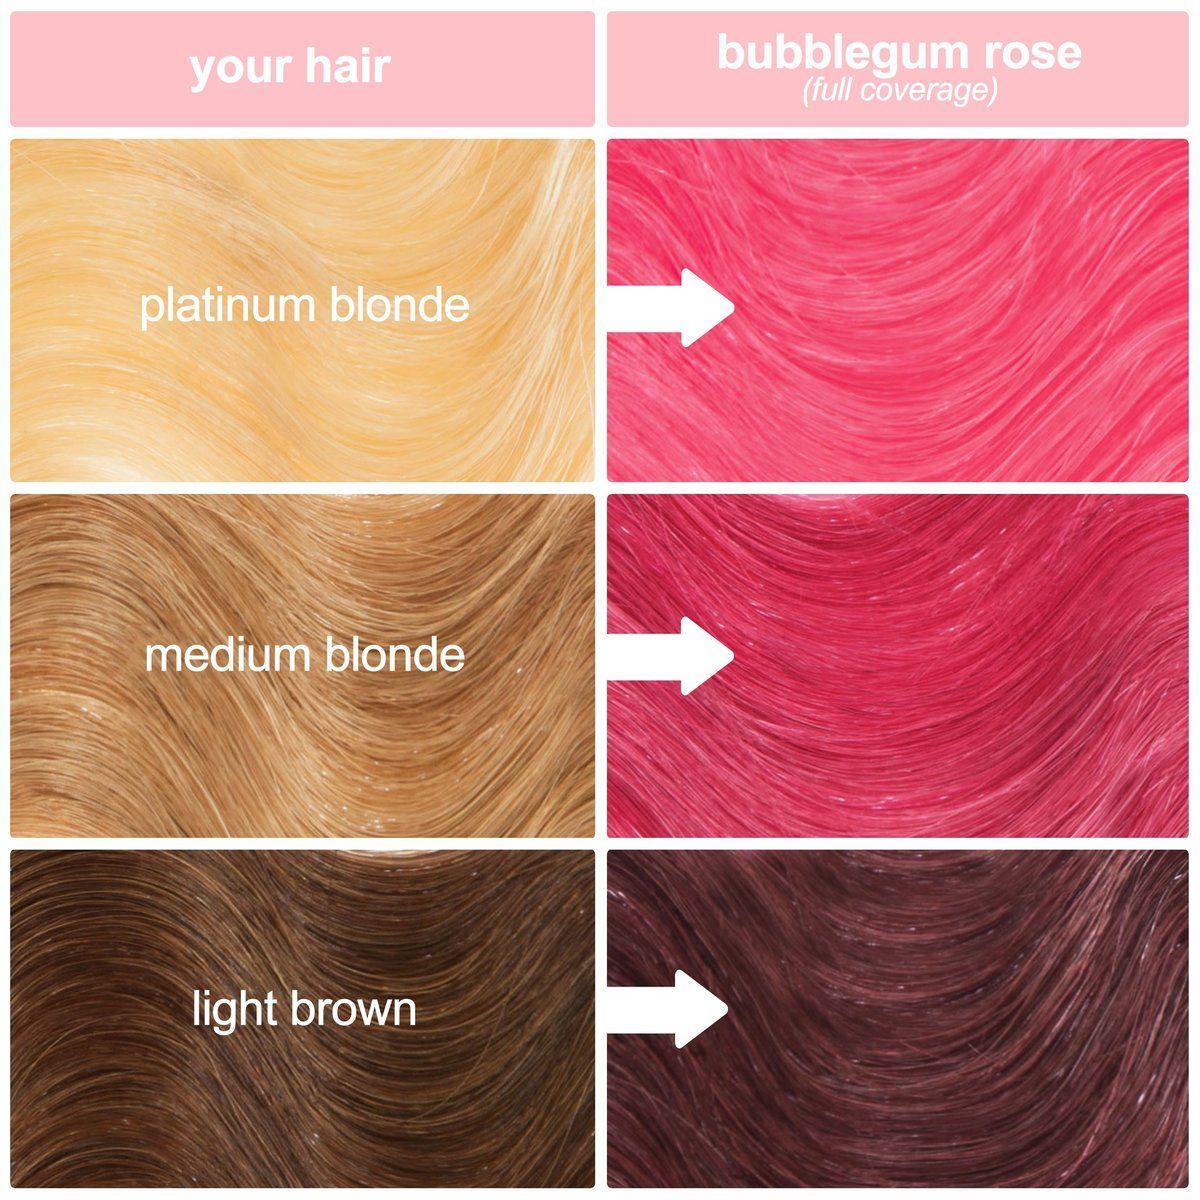 Bubblegum Rose Hair Color Warm Rose Pink Hair Tint Unicorn